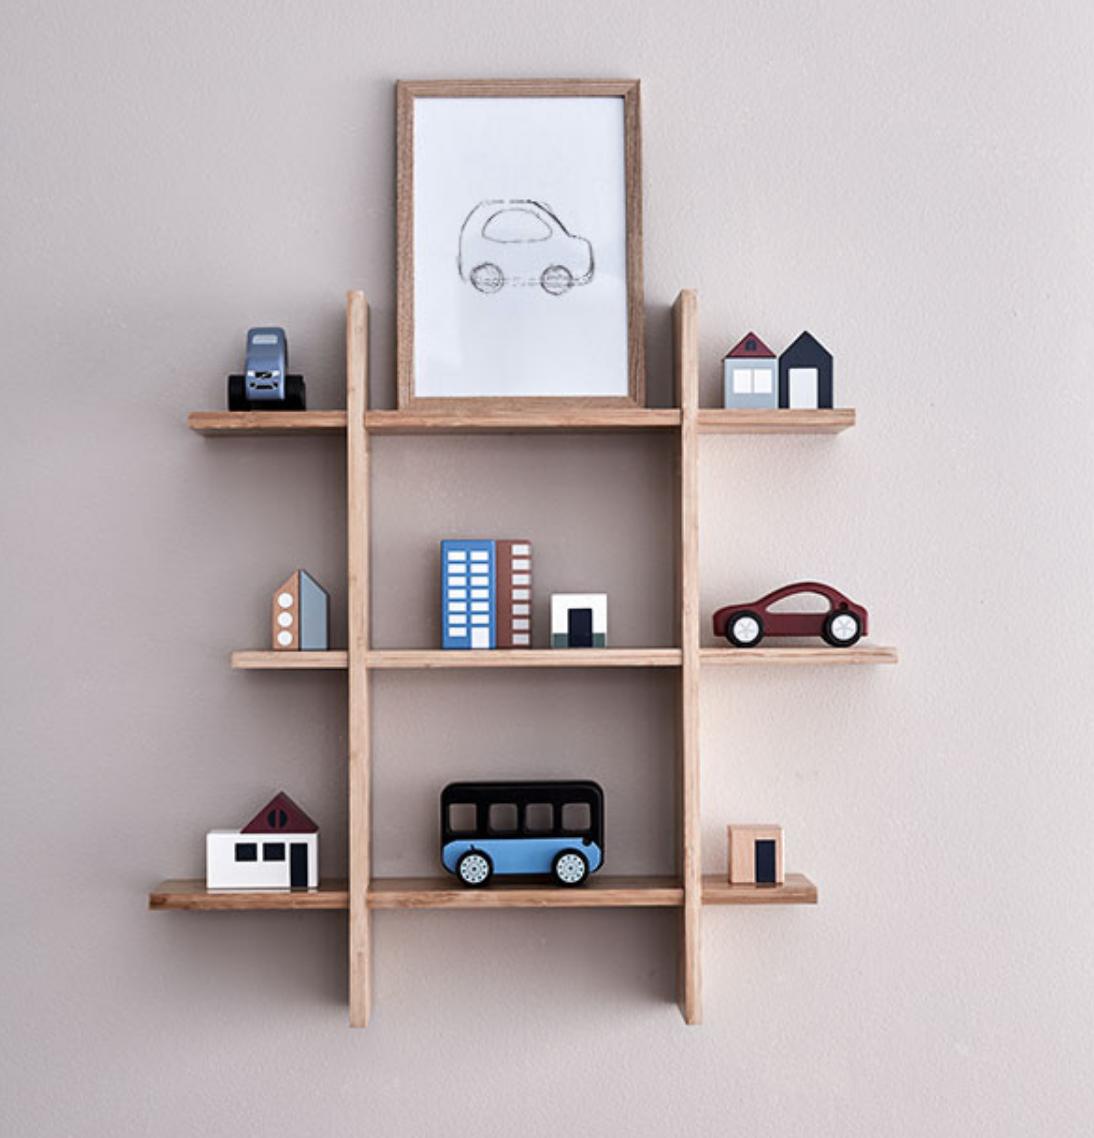 Kids Concept Bamboo Wall Shelf In 2020 Wall Shelves Bamboo Wall Shelves